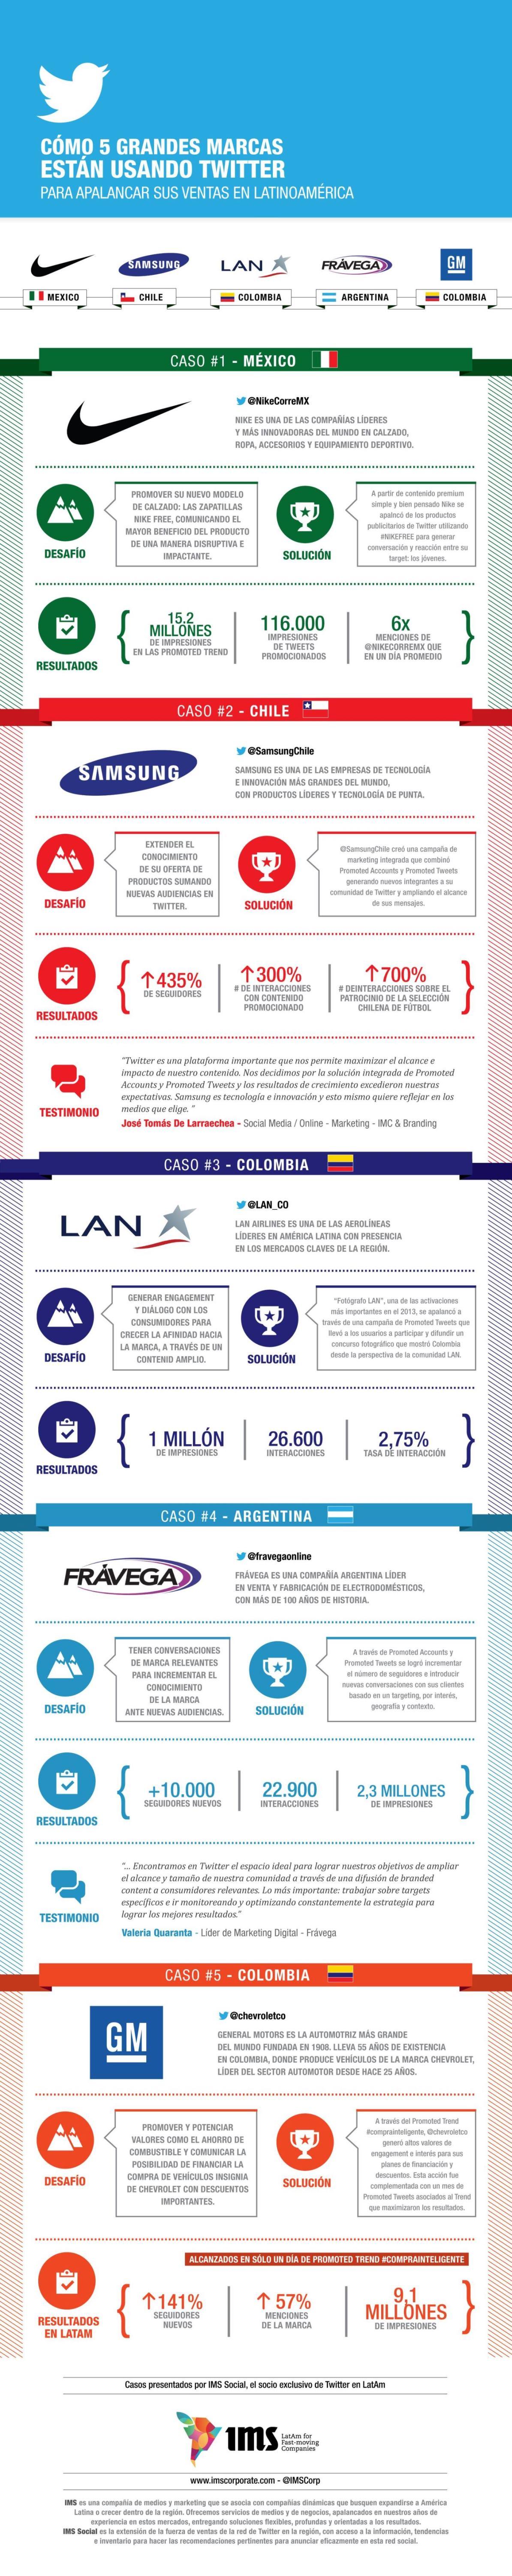 IMS Social Twitter 5 Marcas-INFOGRAFIA-español